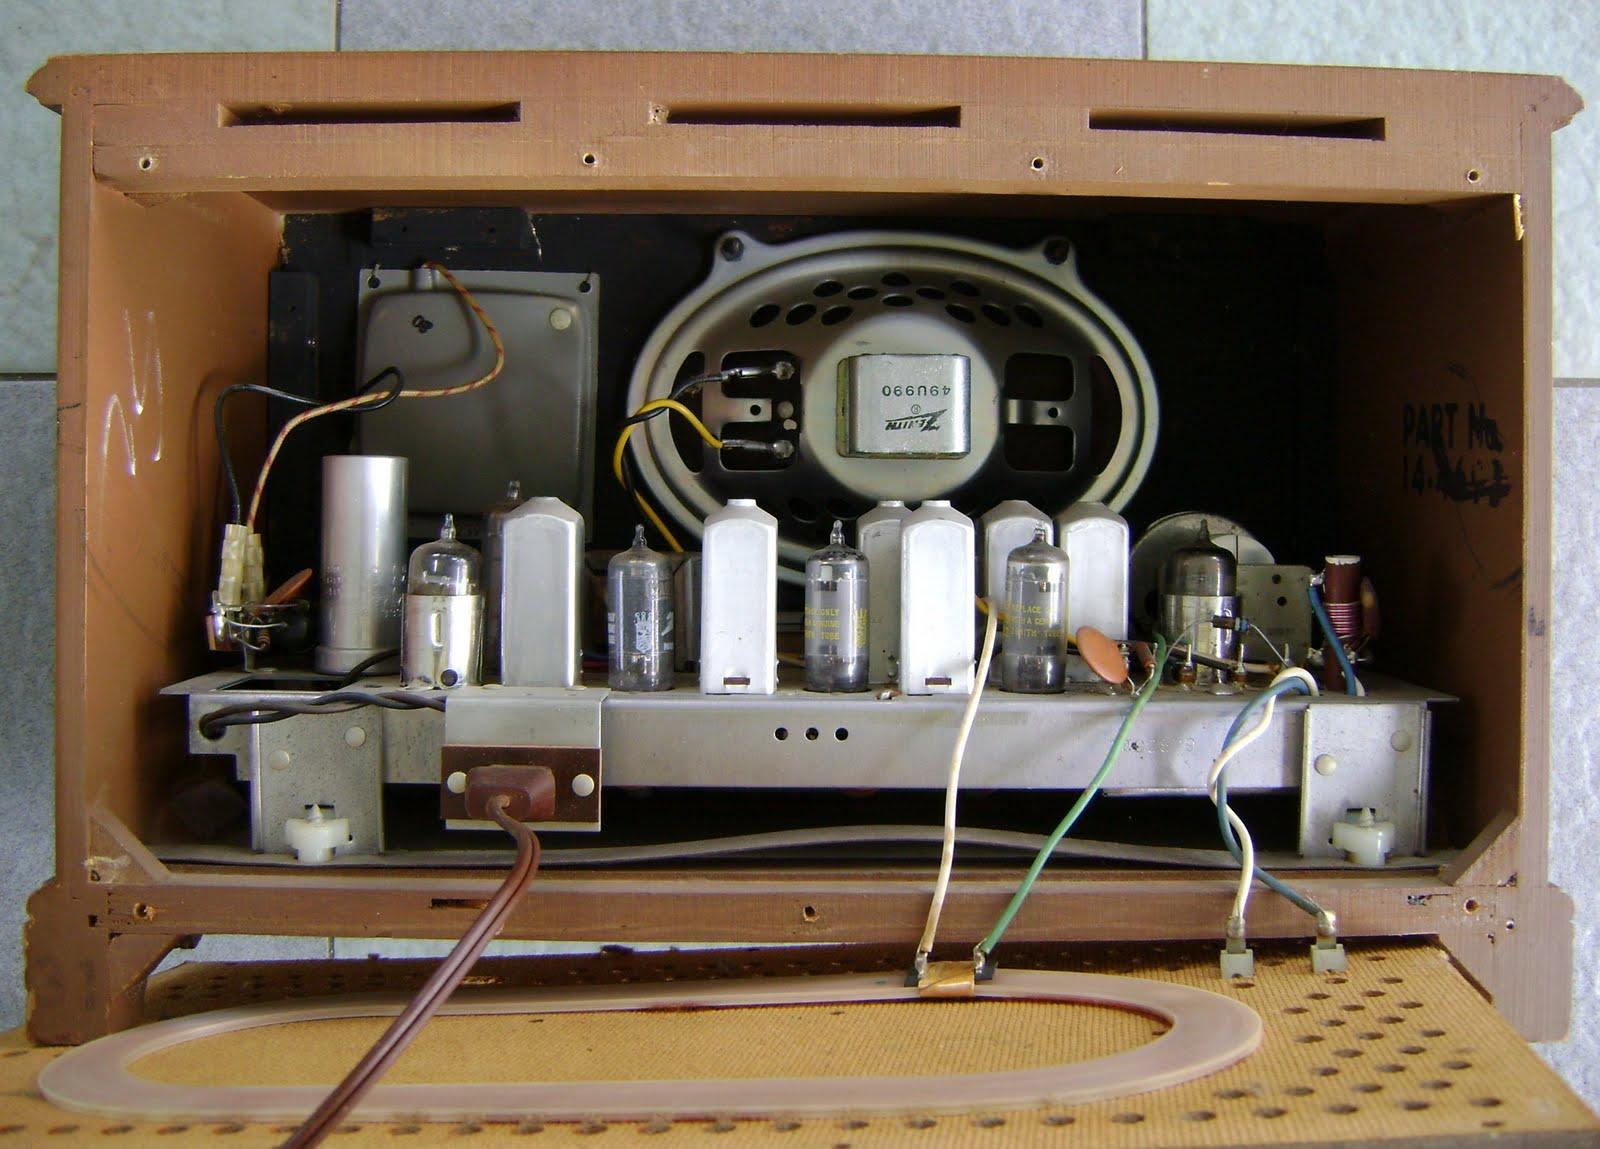 Kinta Valley Audio July 2011. Zenith Model K731 Tube Radio Used Sold. Wiring. Zenith Radio Schematics Model C730 At Scoala.co